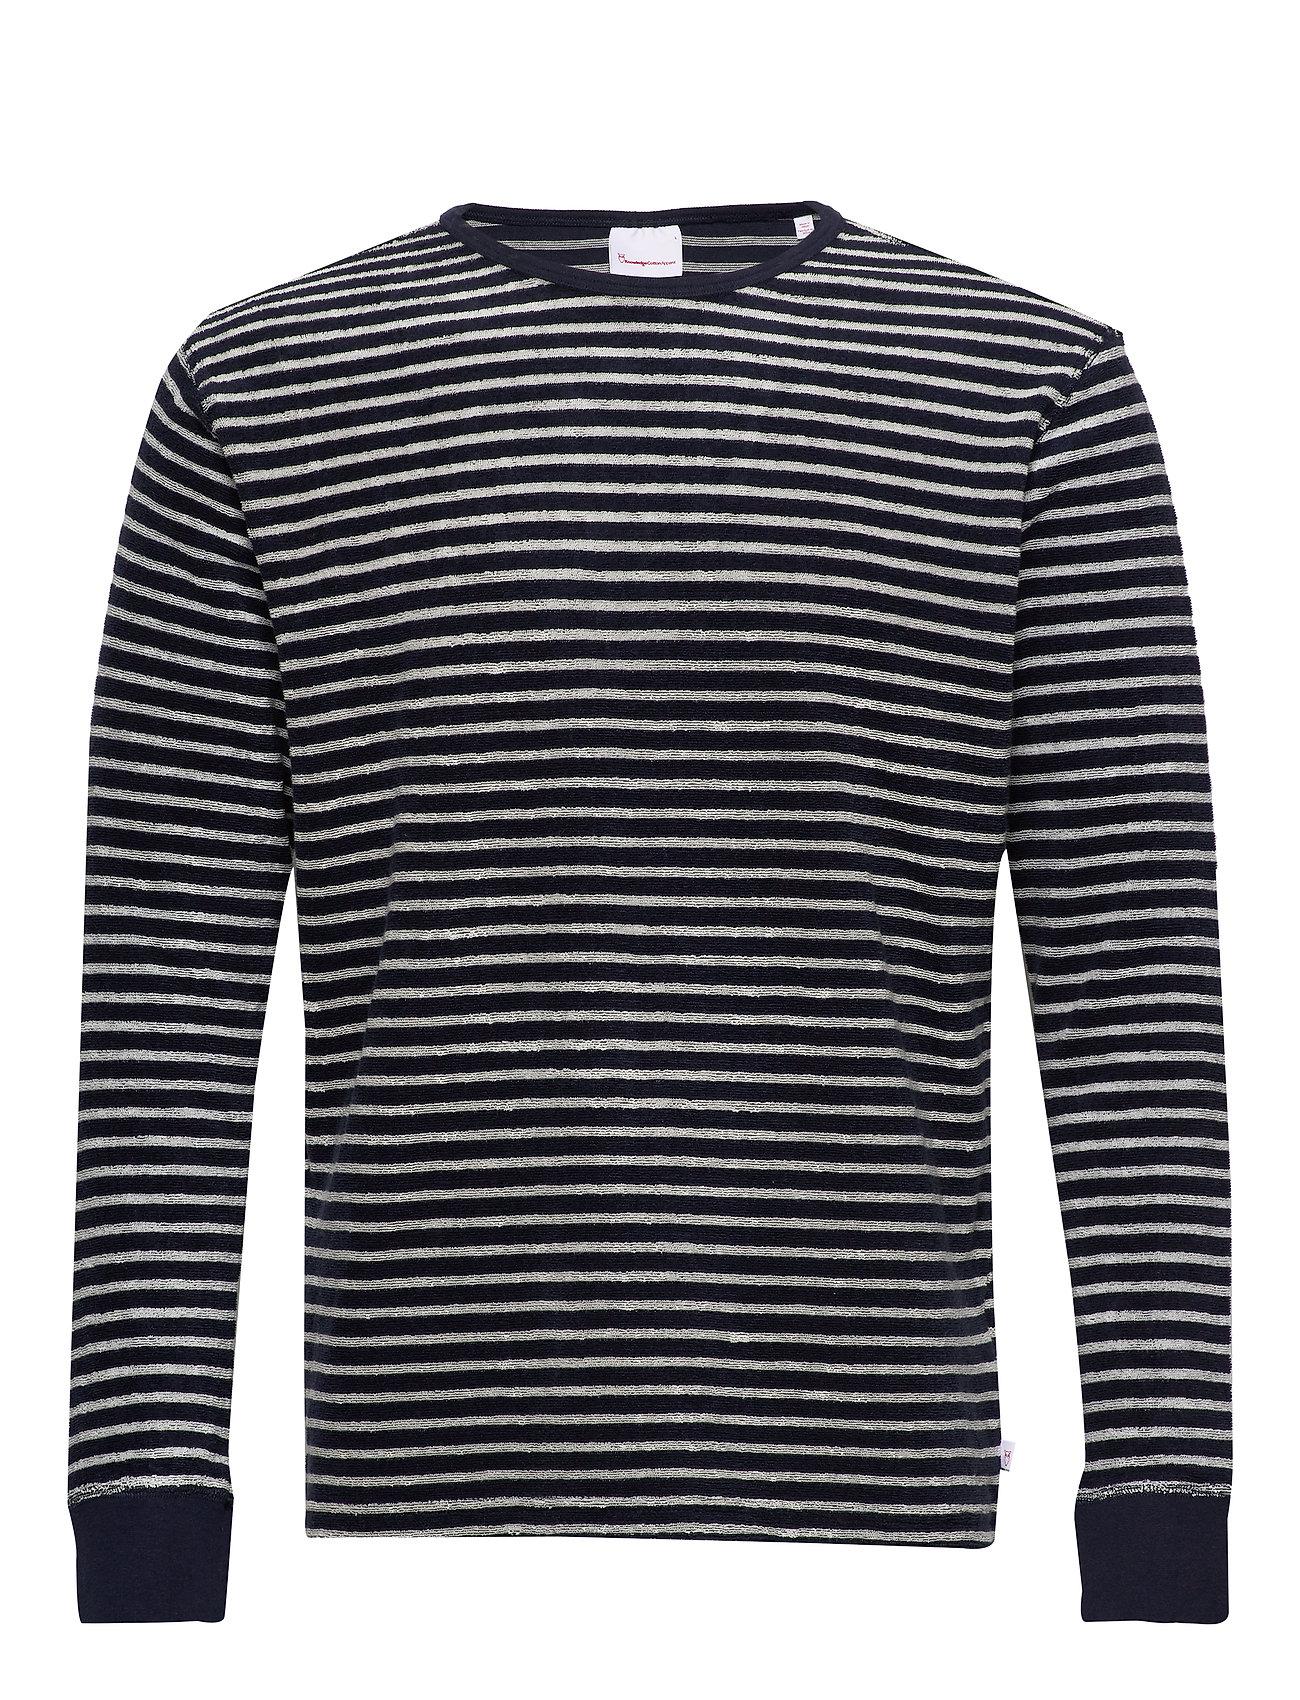 Knowledge Cotton Apparel Striped velvet sweat - Vegan - TOTAL ECLIPSE